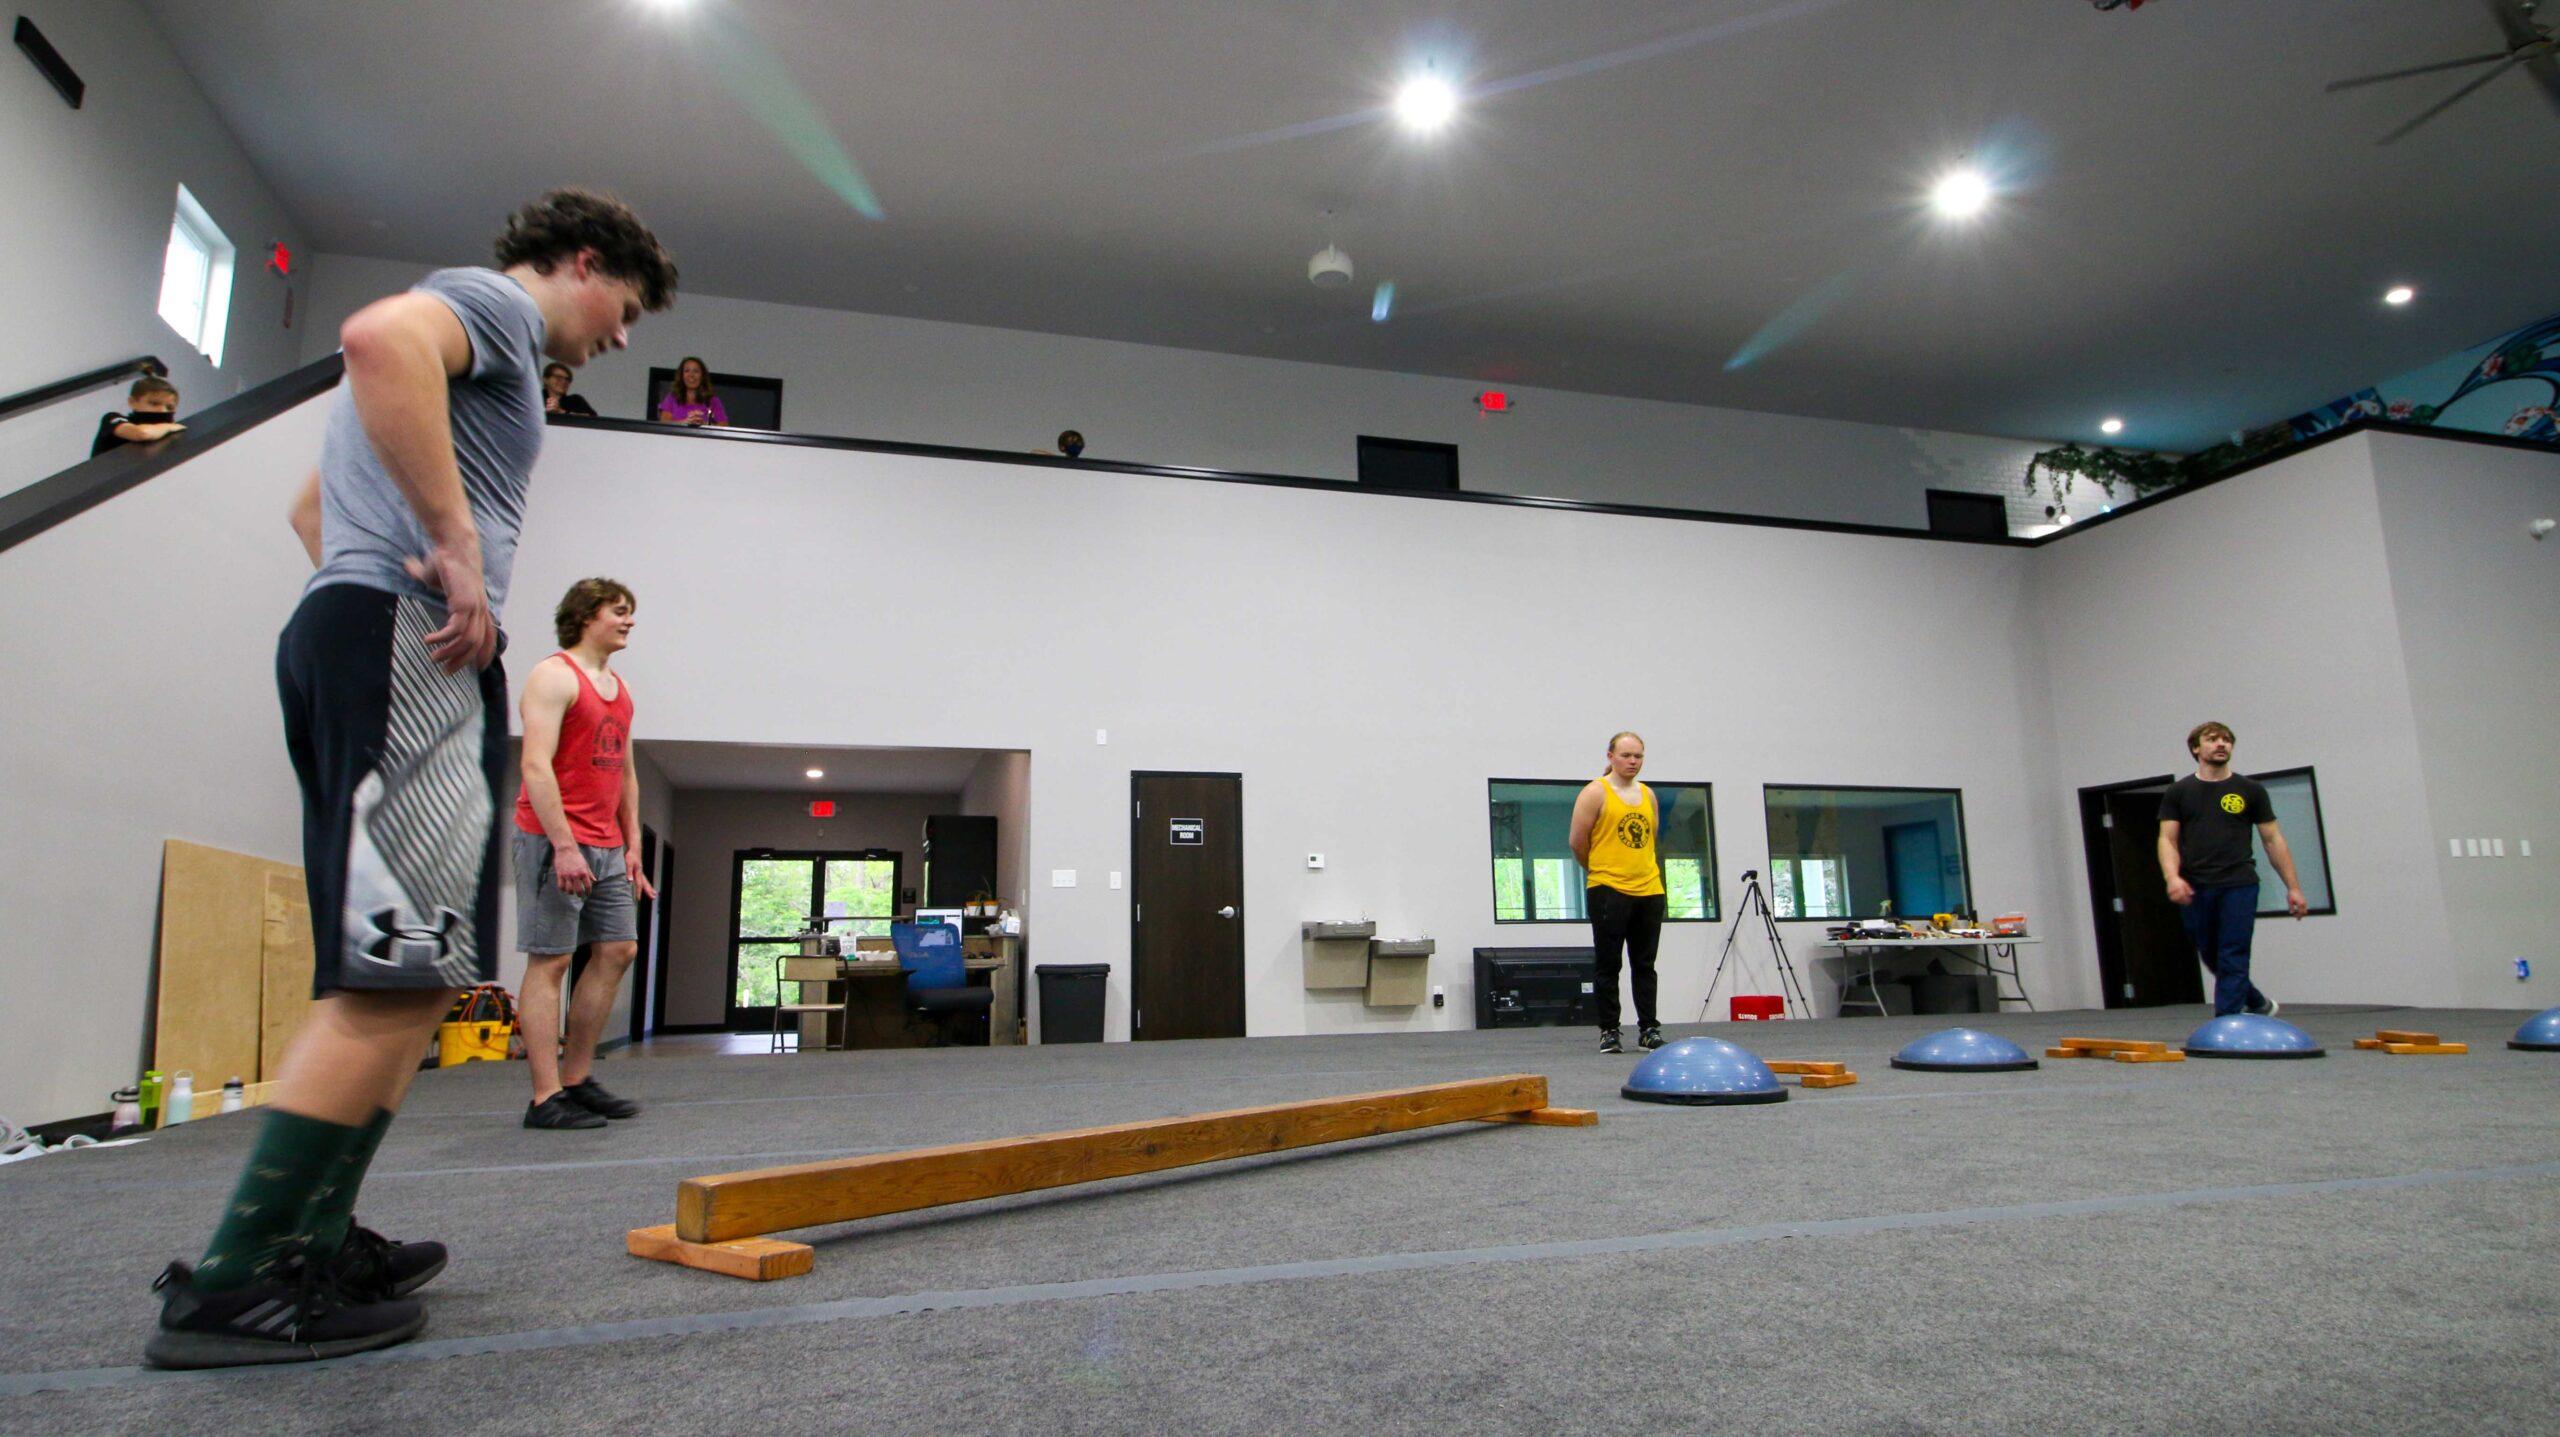 Balancing class inside the facility